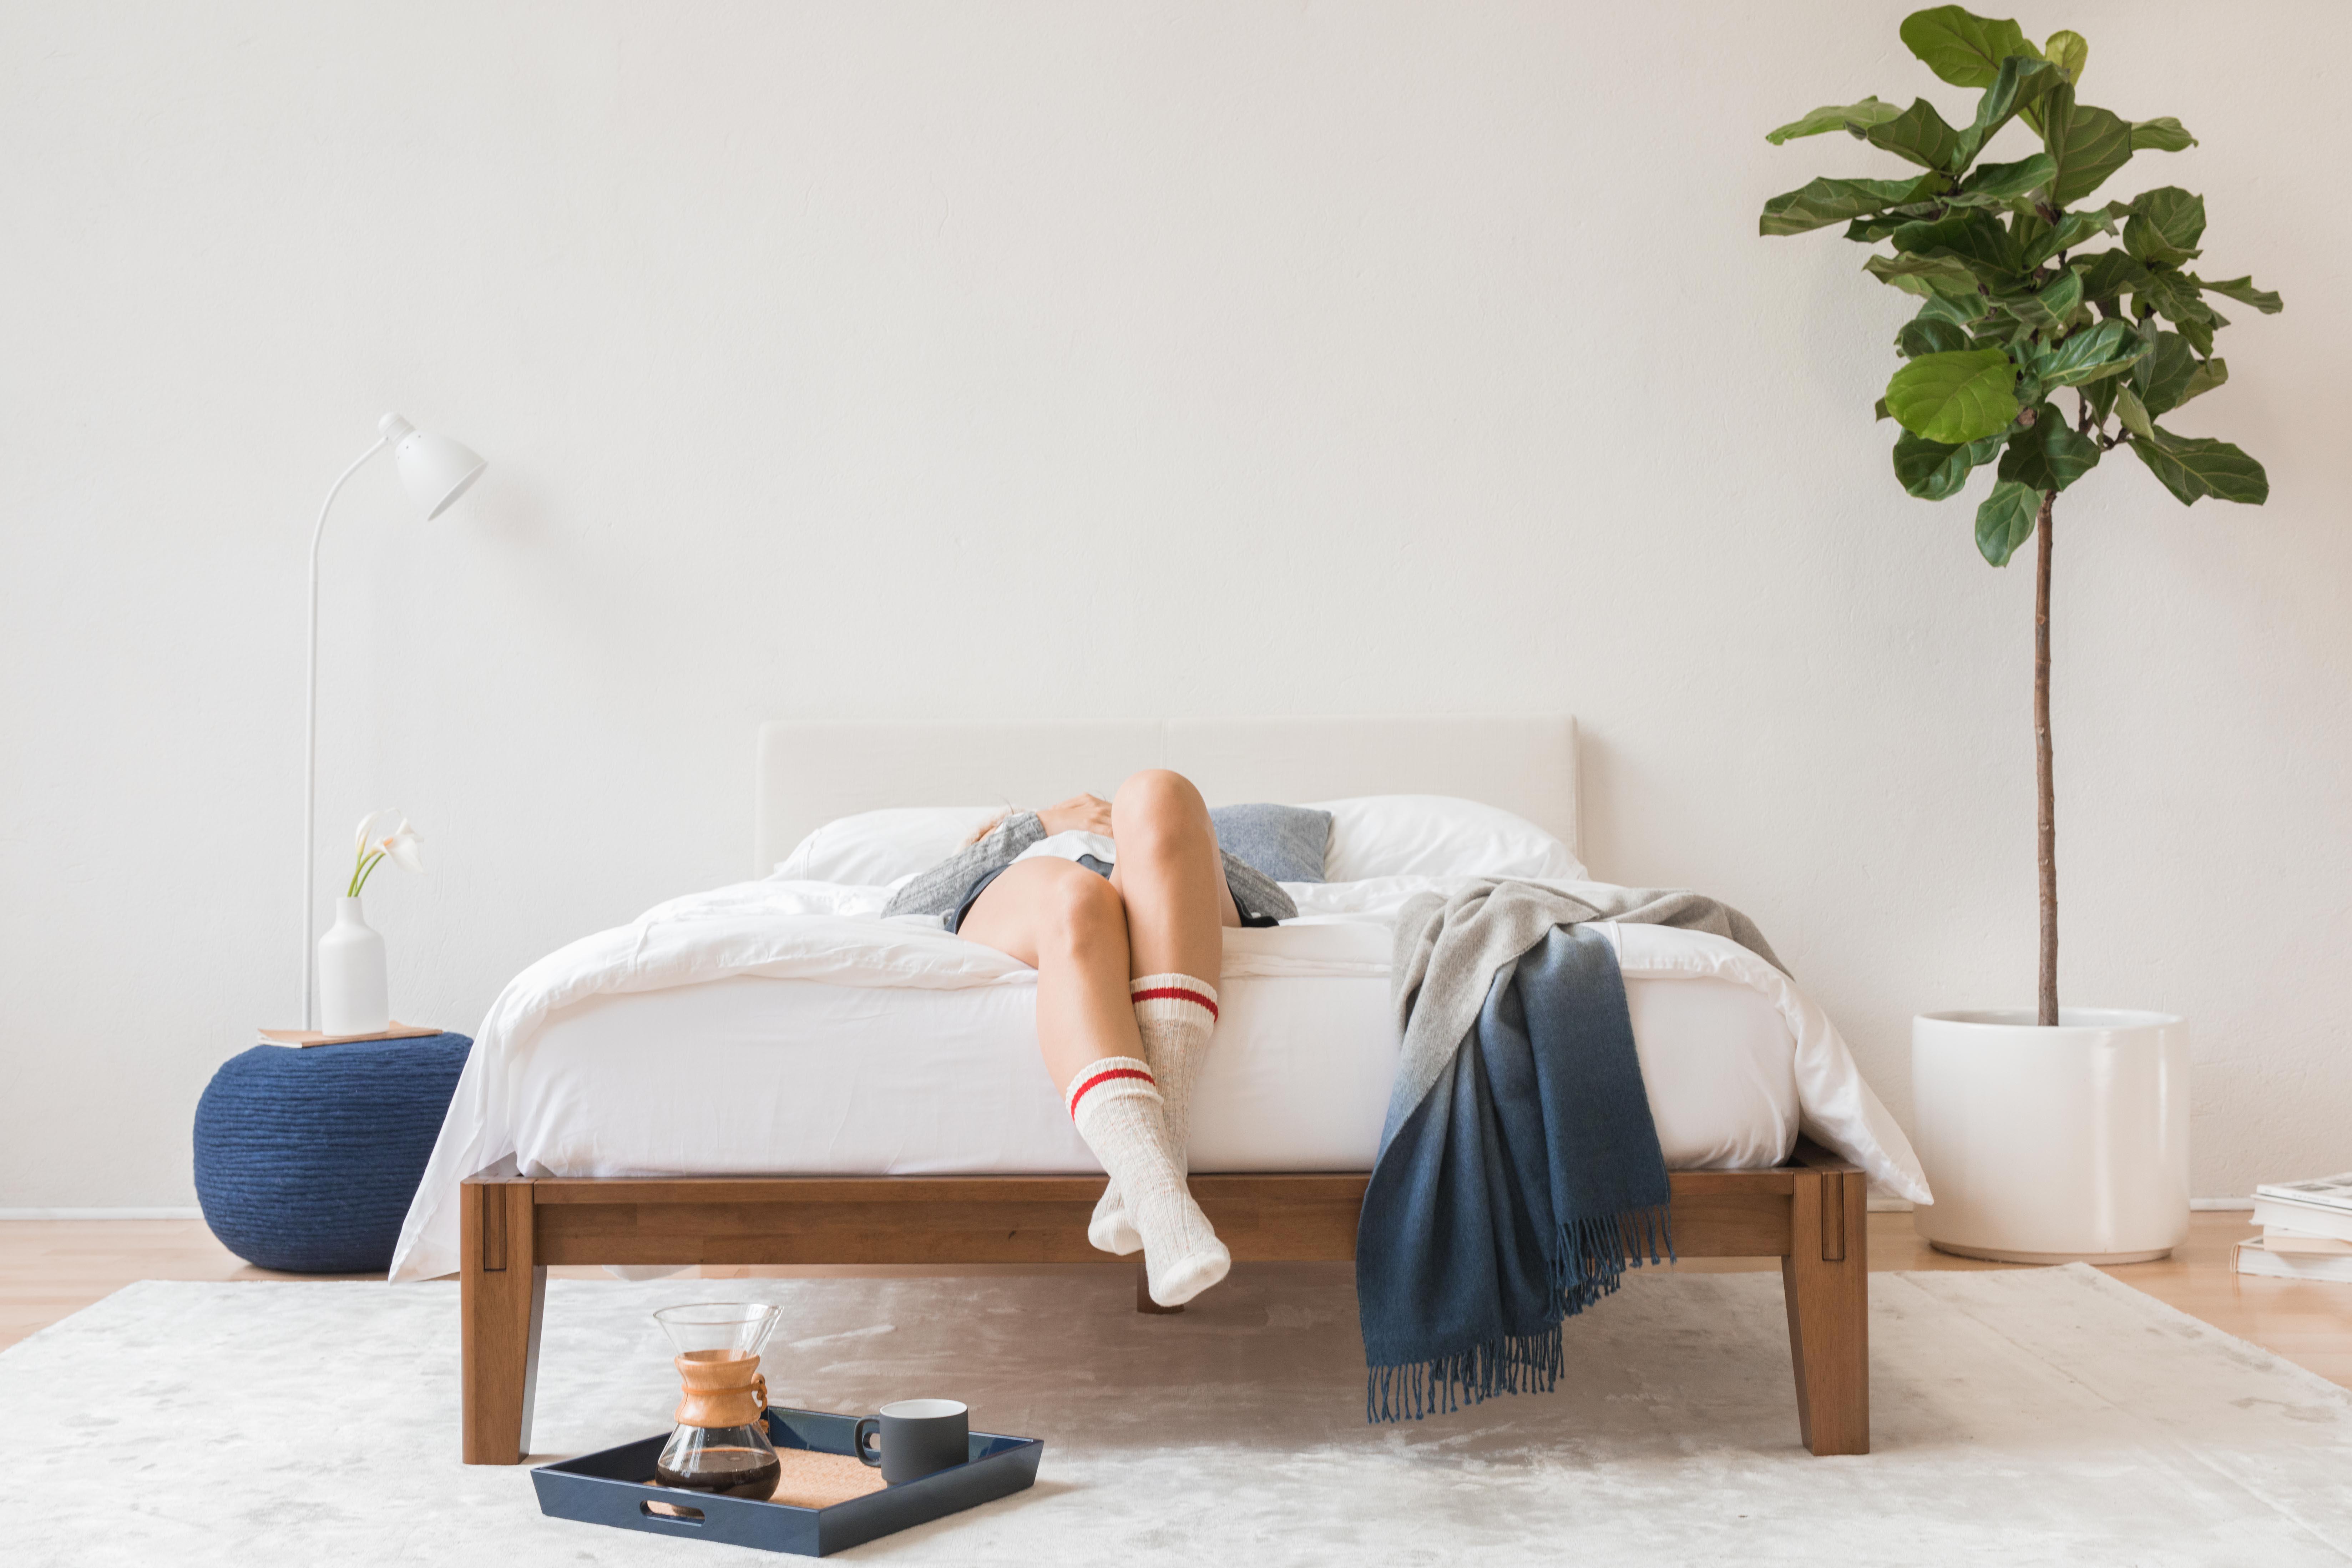 Elevated Design Thuma Platform Bed Frame Matress Single Bed